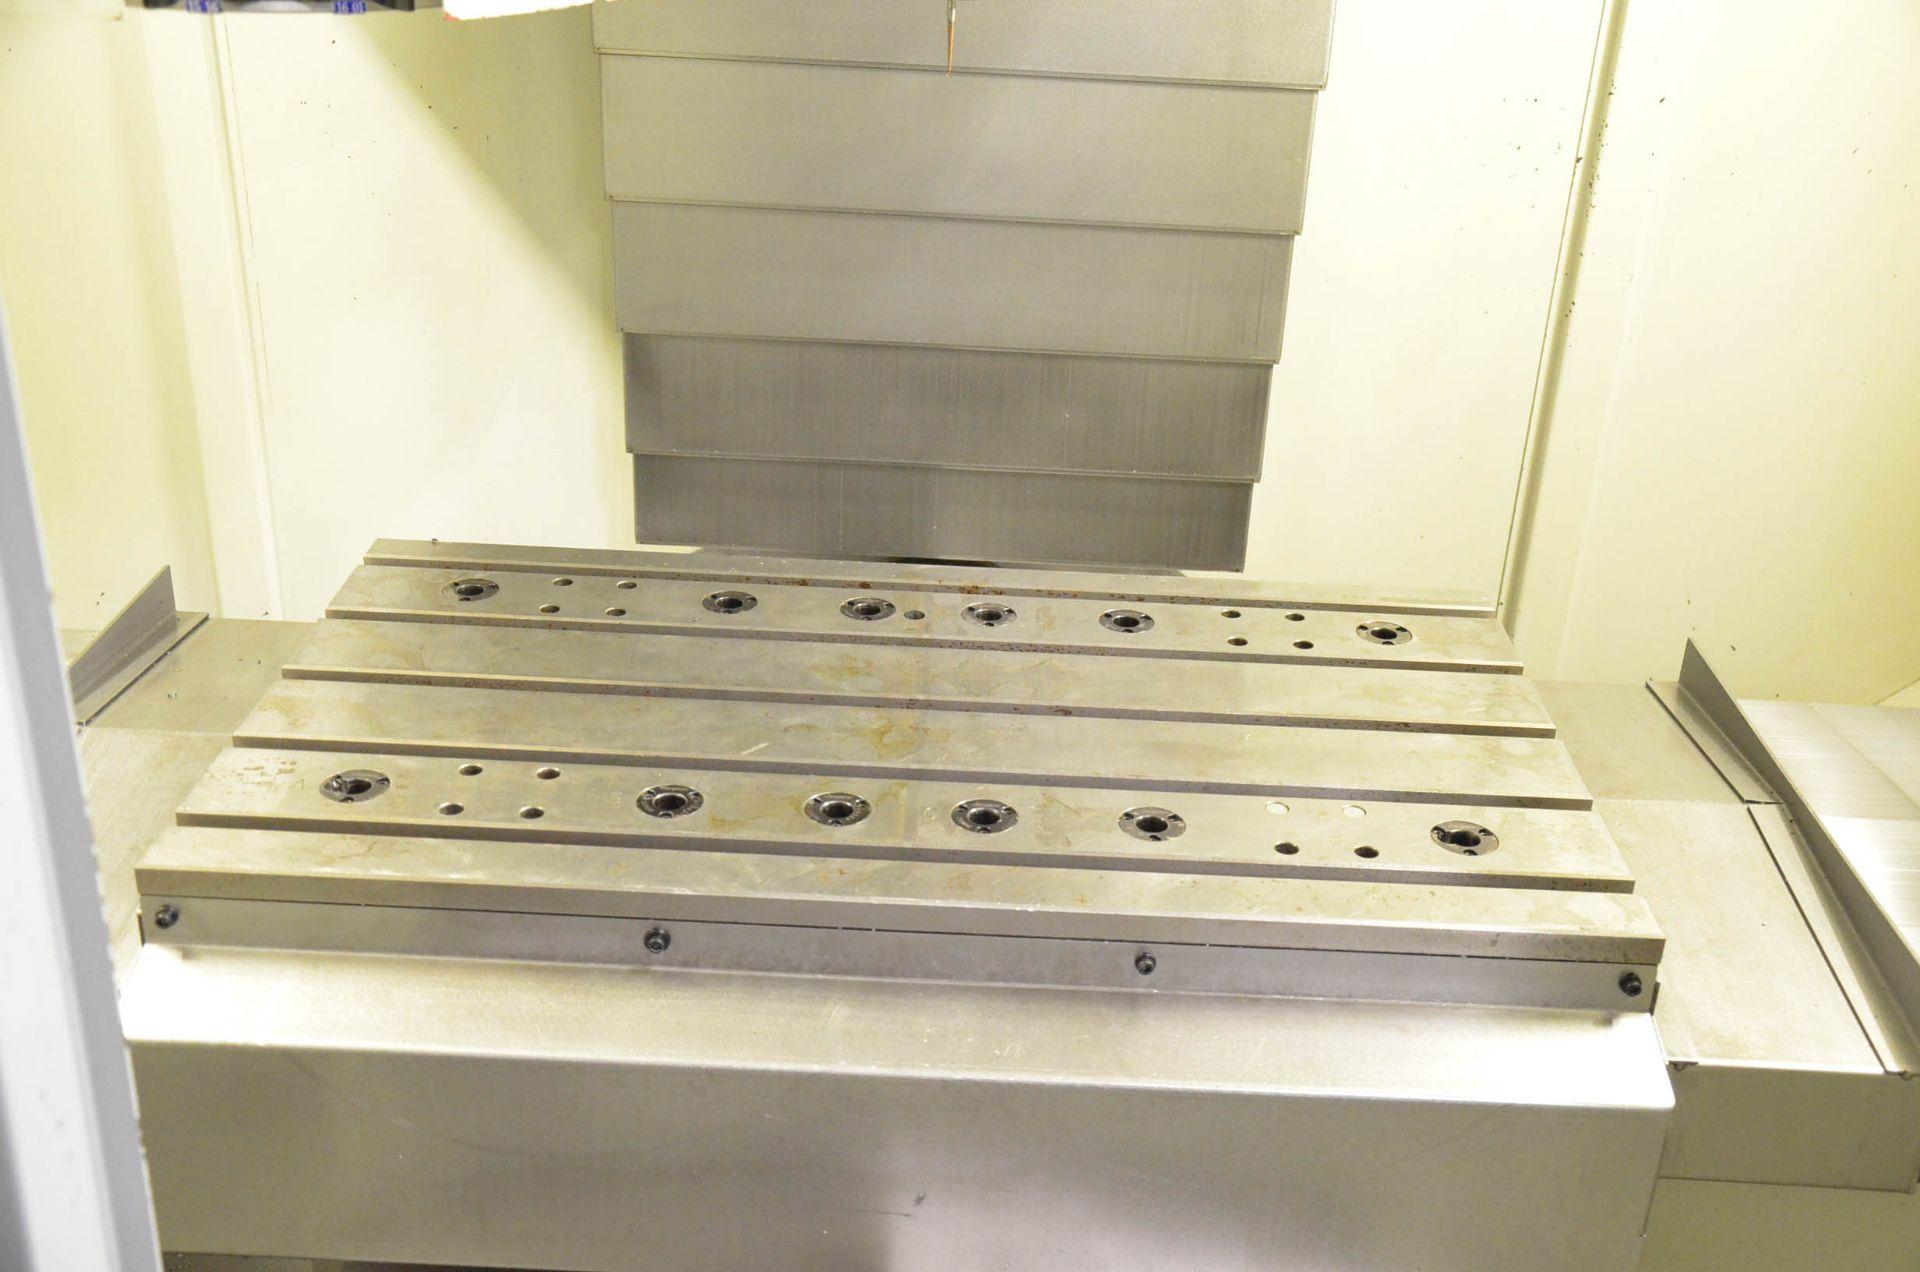 SWI (2012) TRAK LPM 4-AXIS READY CNC VERTICAL MACHINING CENTER WITH PROTO TRAK PMX CNC CONTROL, 19. - Image 5 of 10